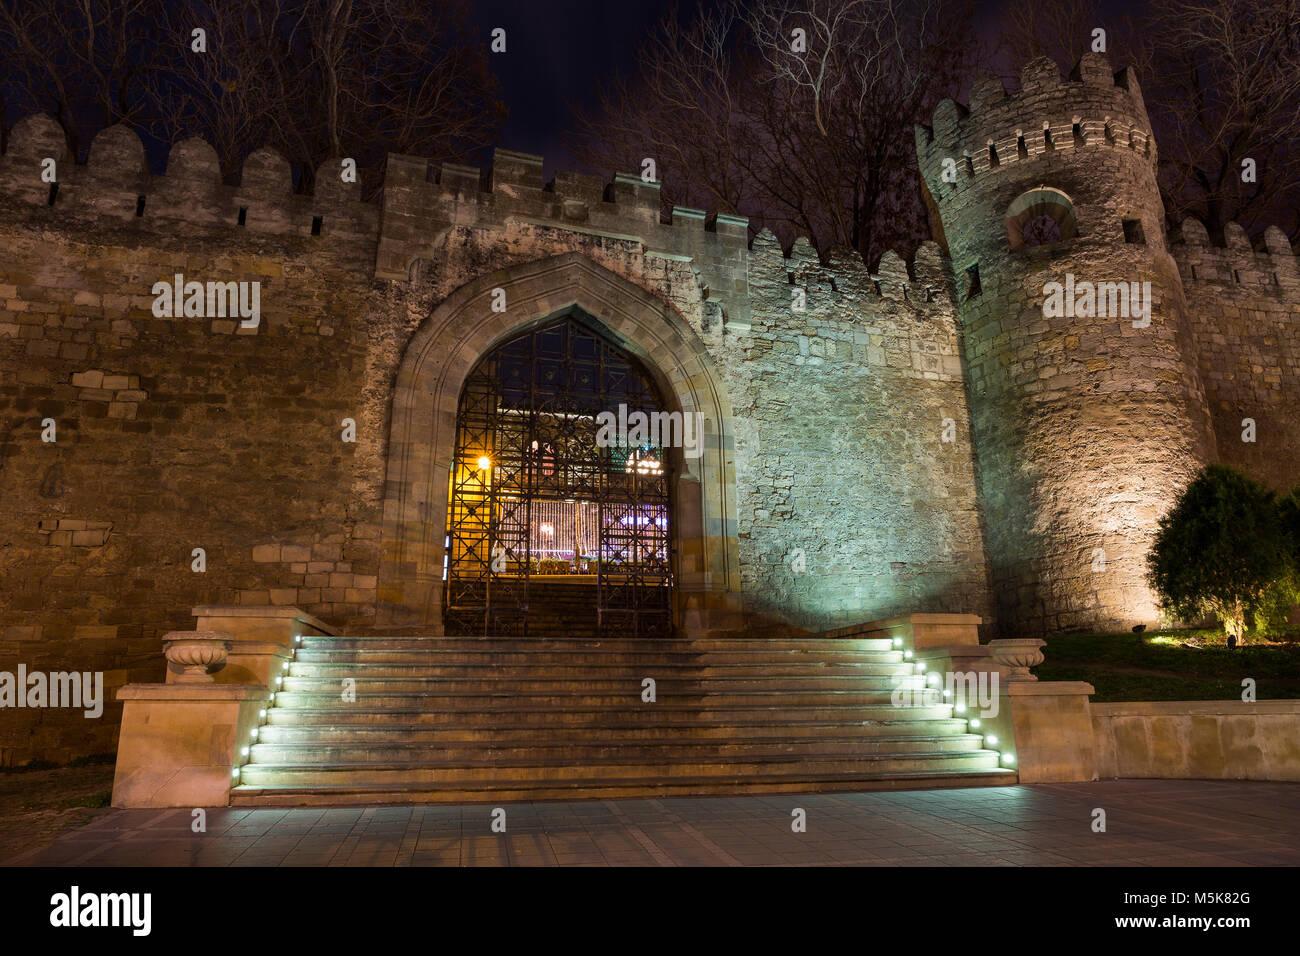 Gate of the old fortress, entrance to Baku old town. Baku, Azerbaijan. - Stock Image